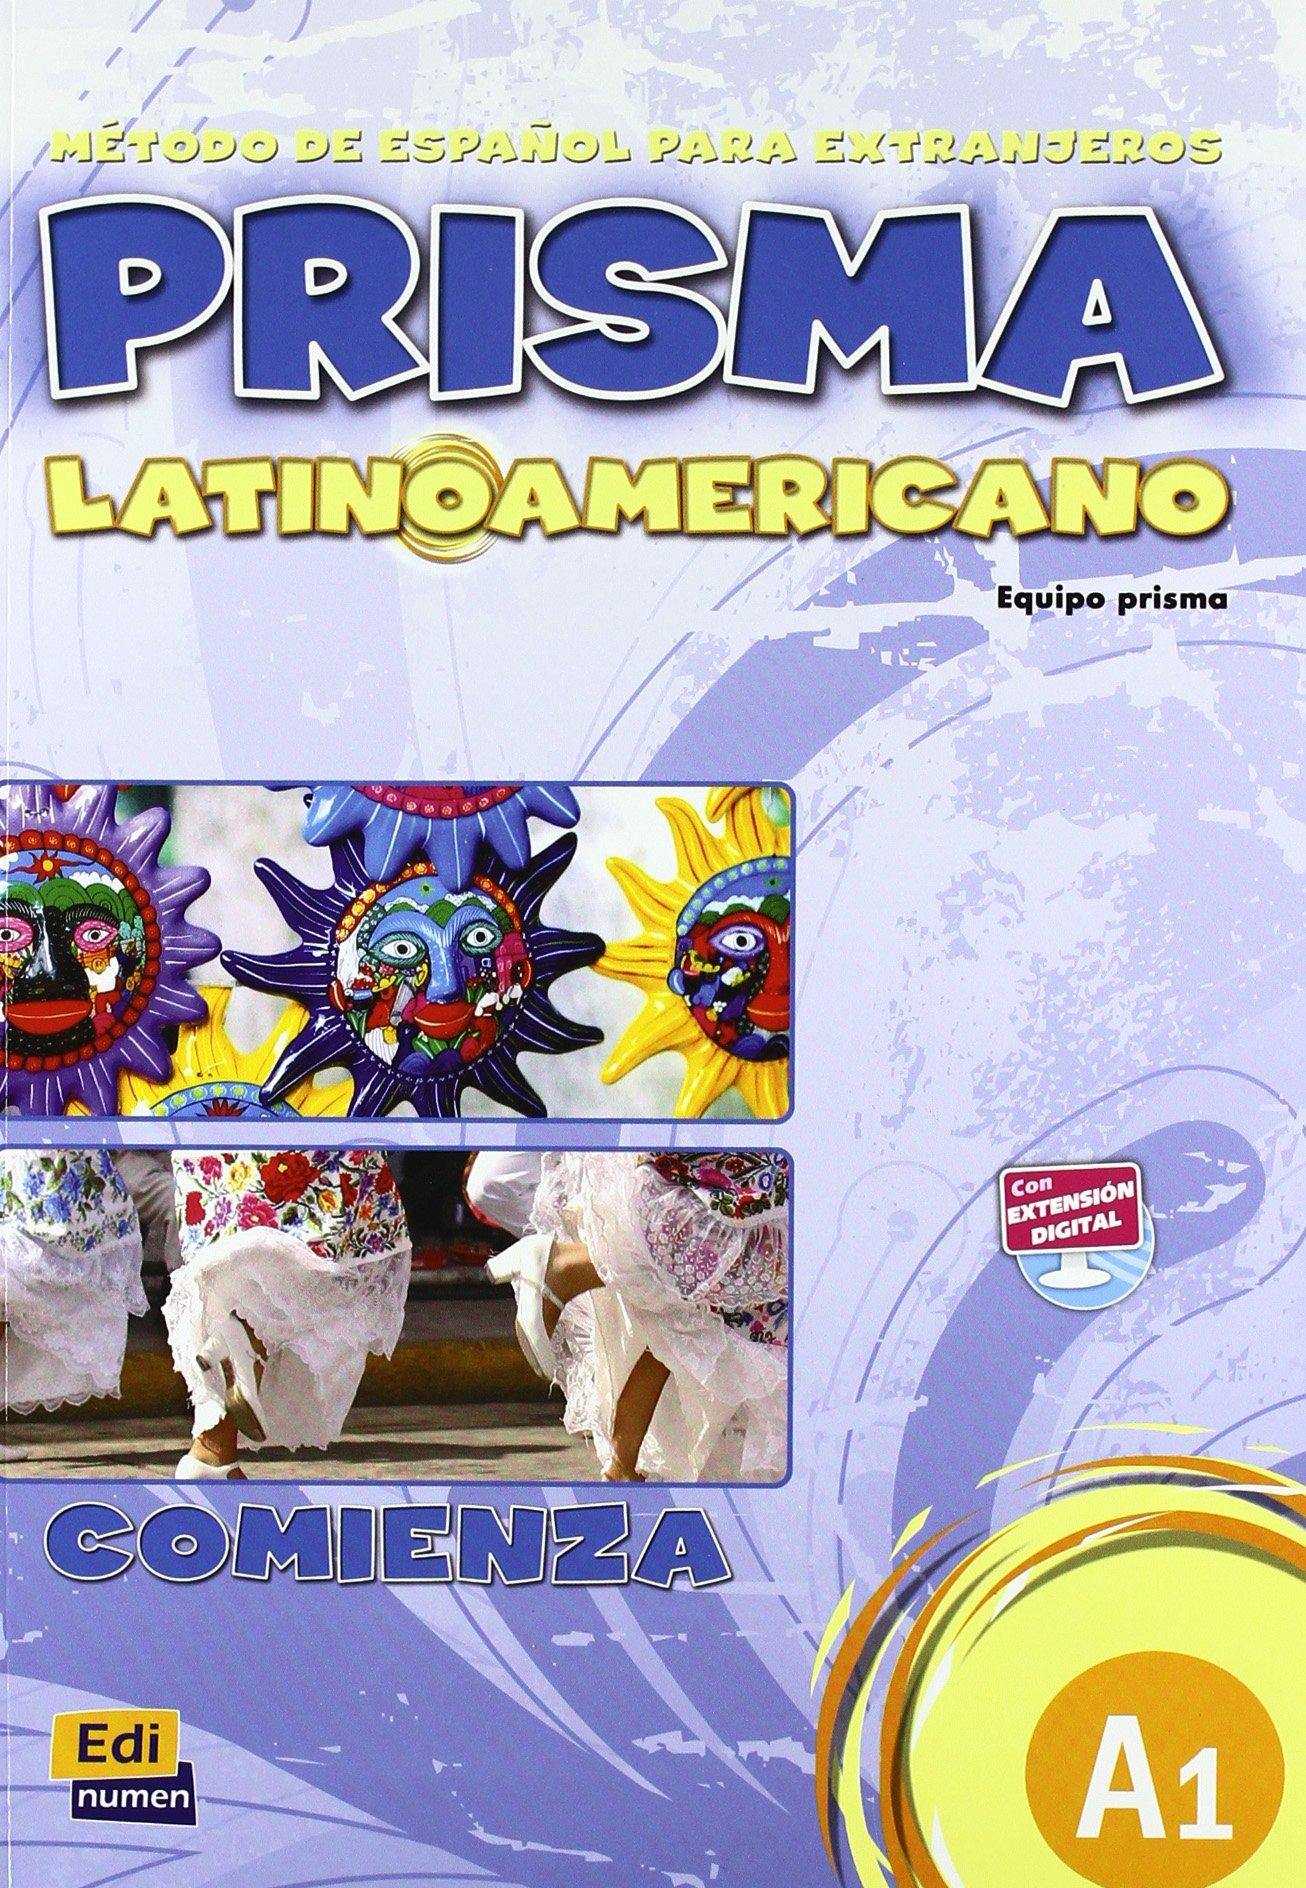 Prisma latinoamericano nivel a1 latin american prisma level a1 prisma latinoamericano nivel a1 latin american prisma level a1 comienza start metodo de espanol para extranjeros spanish language for foreigners fandeluxe Images